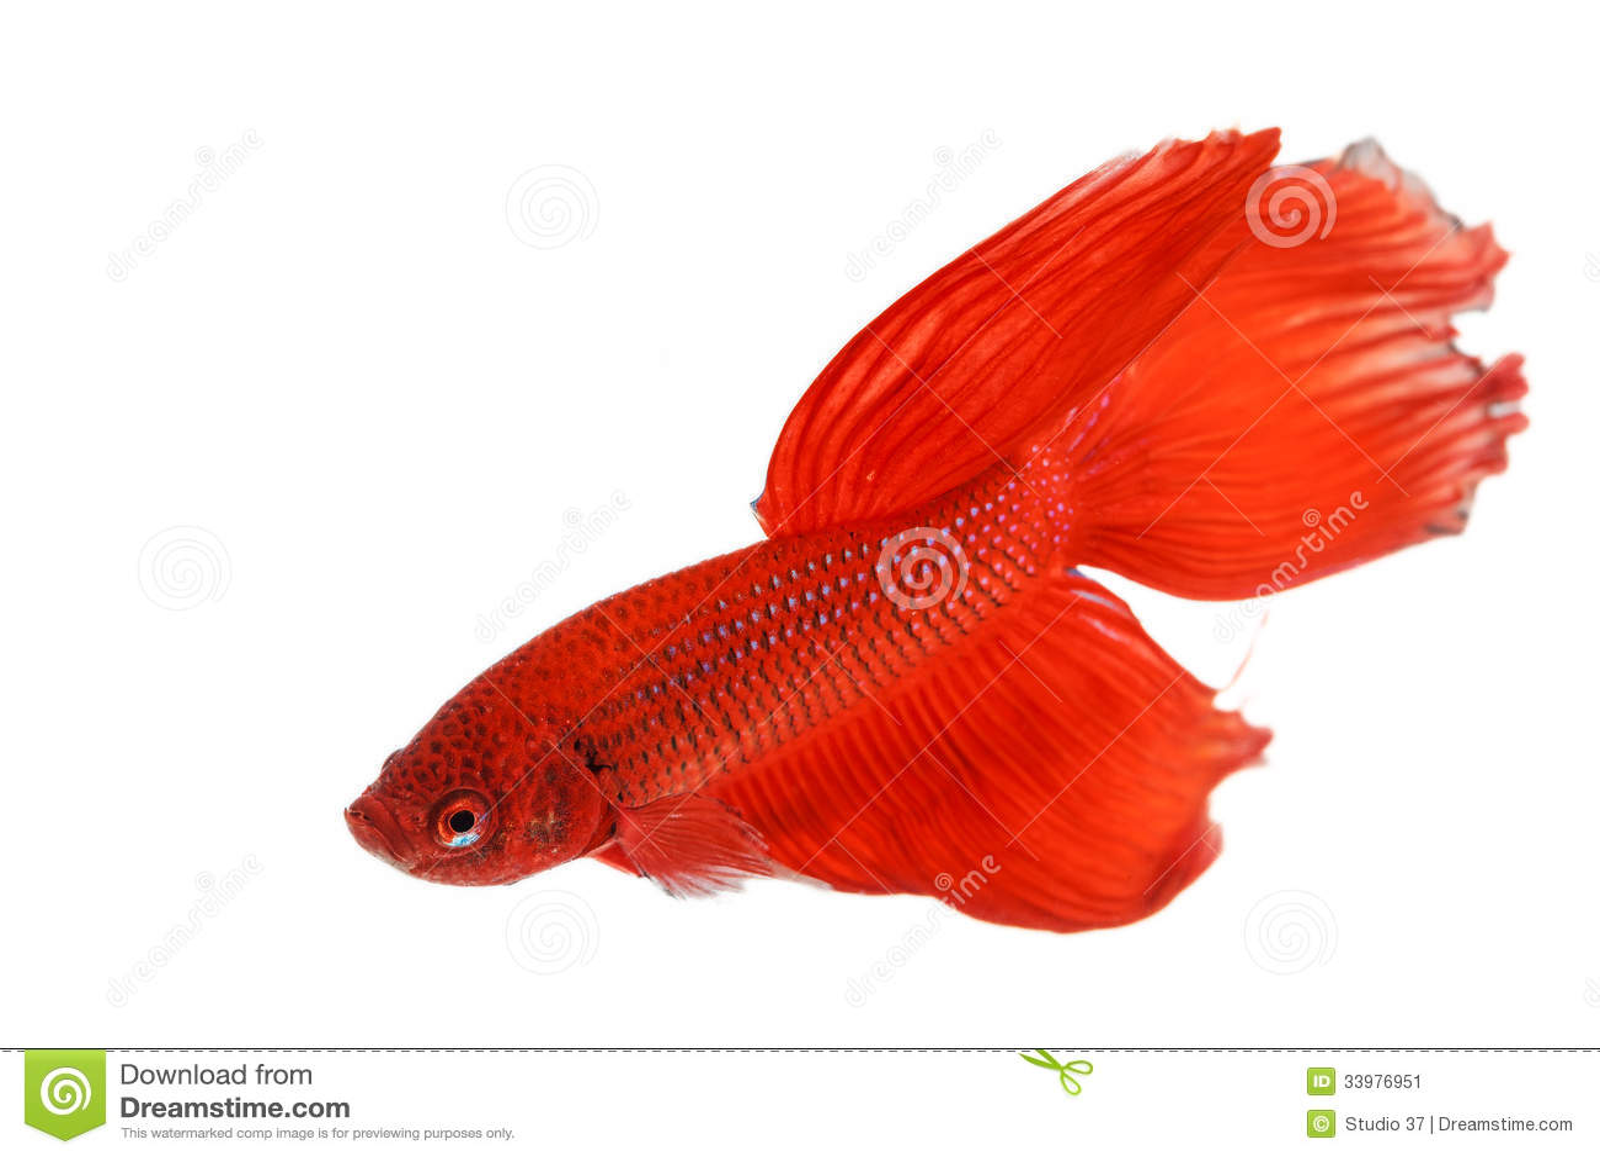 Roter siamesischer kampffisch stockbild bild 33976951 for Siamesischer kampffisch